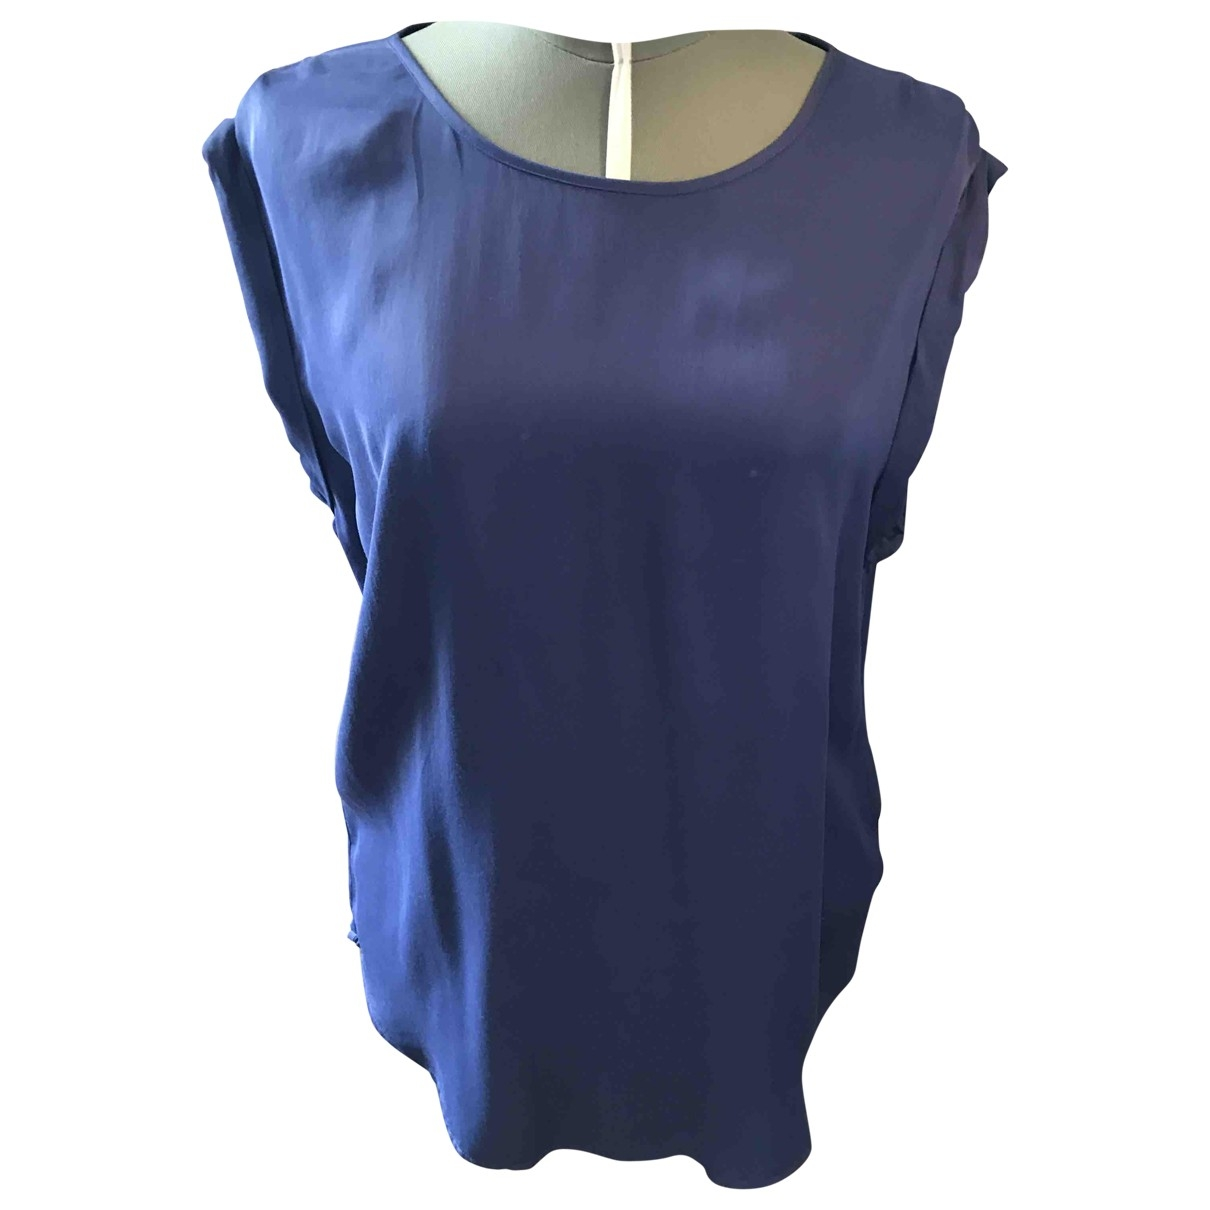 Reiss \N Blue  top for Women 10 UK